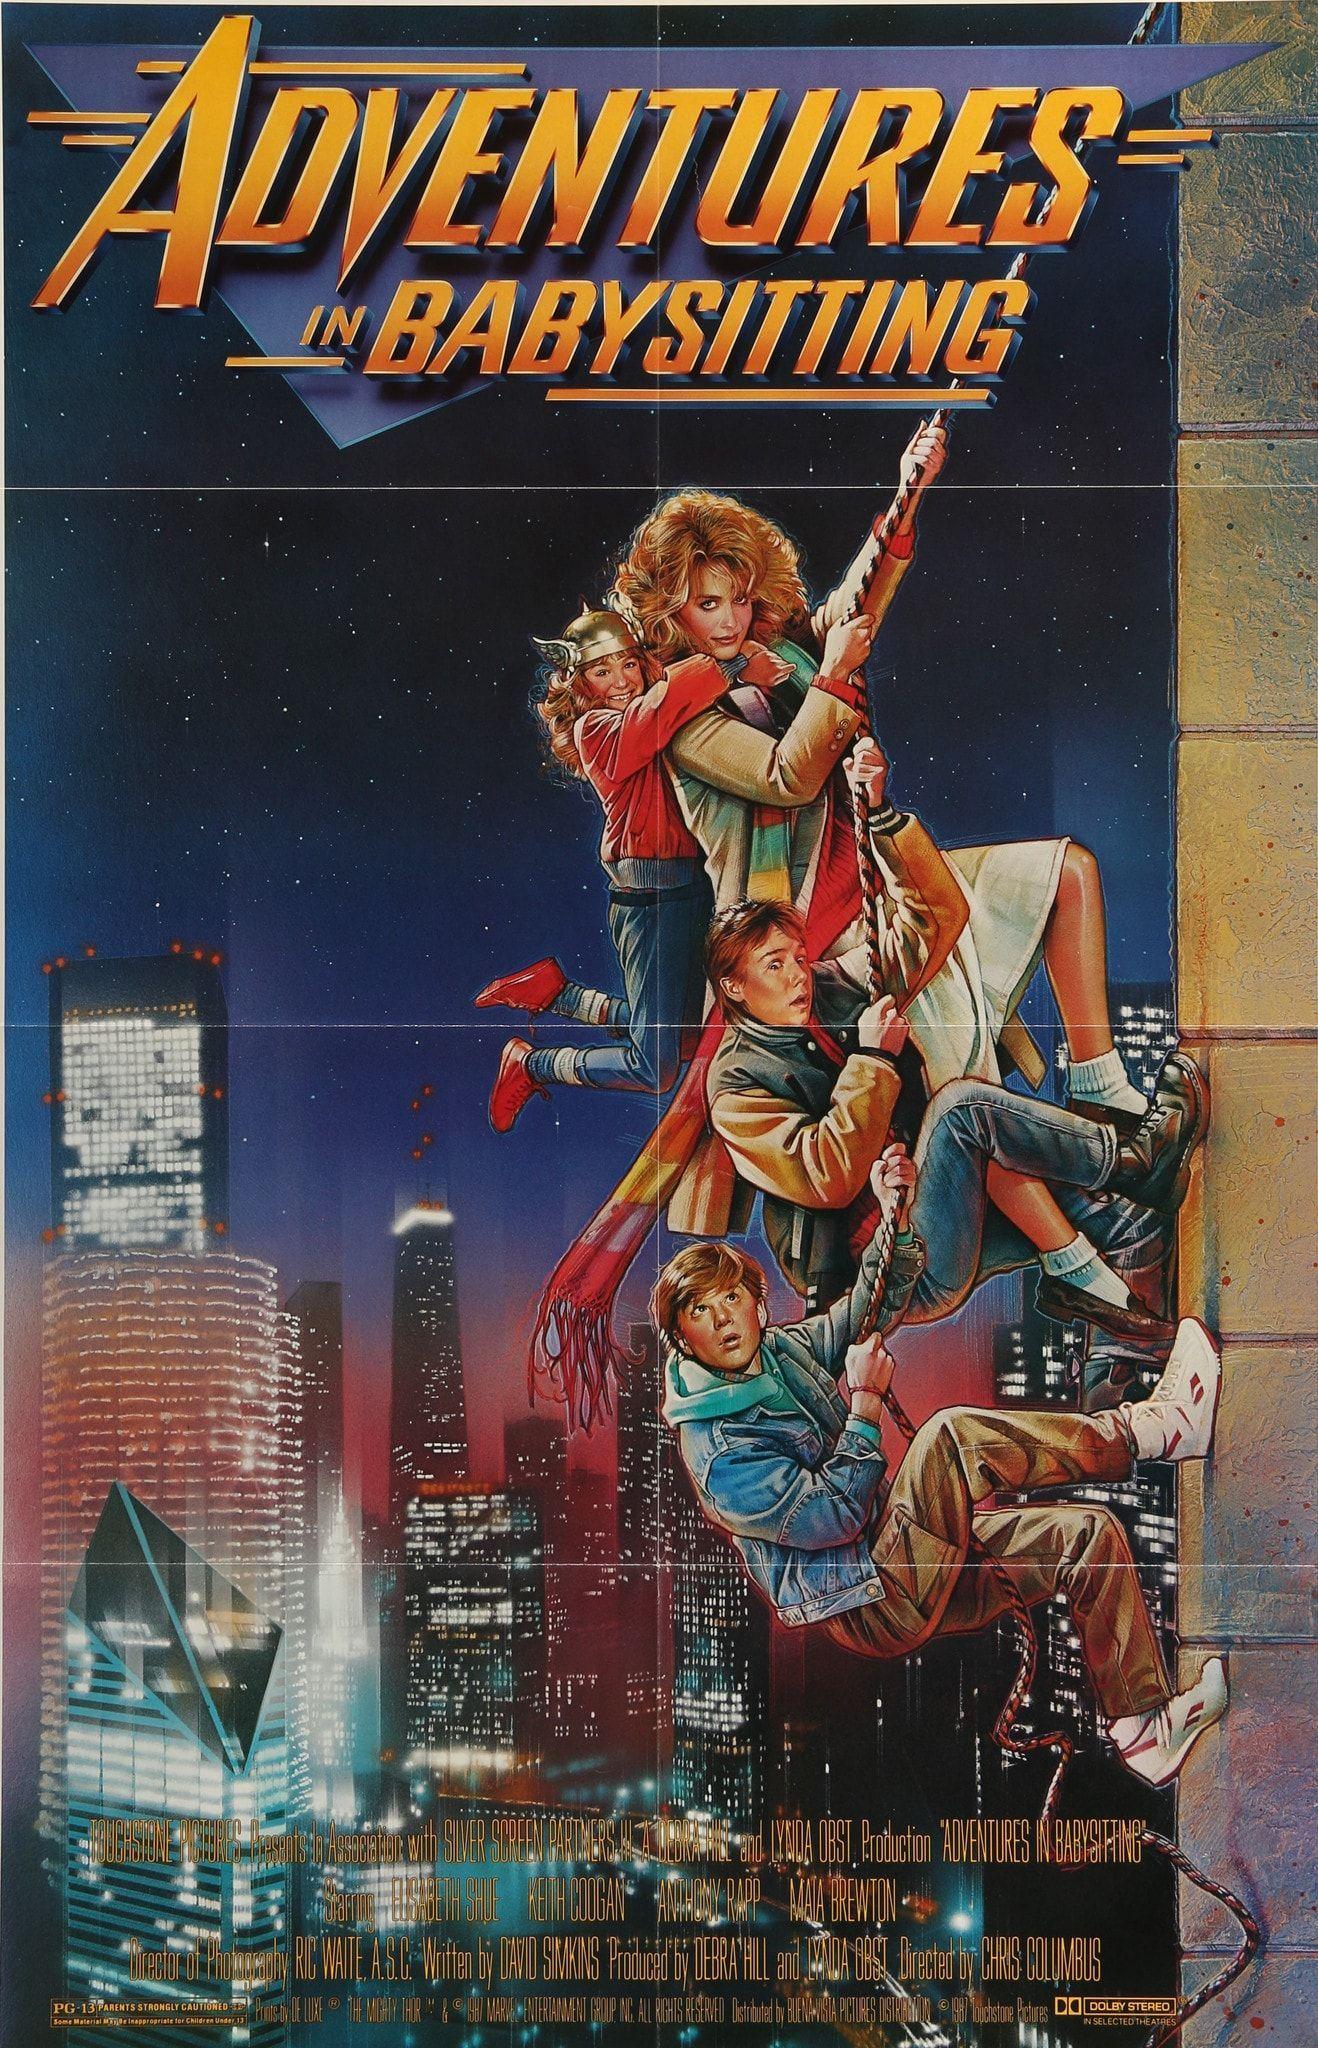 Pin On Movie Posters At Original Film Art